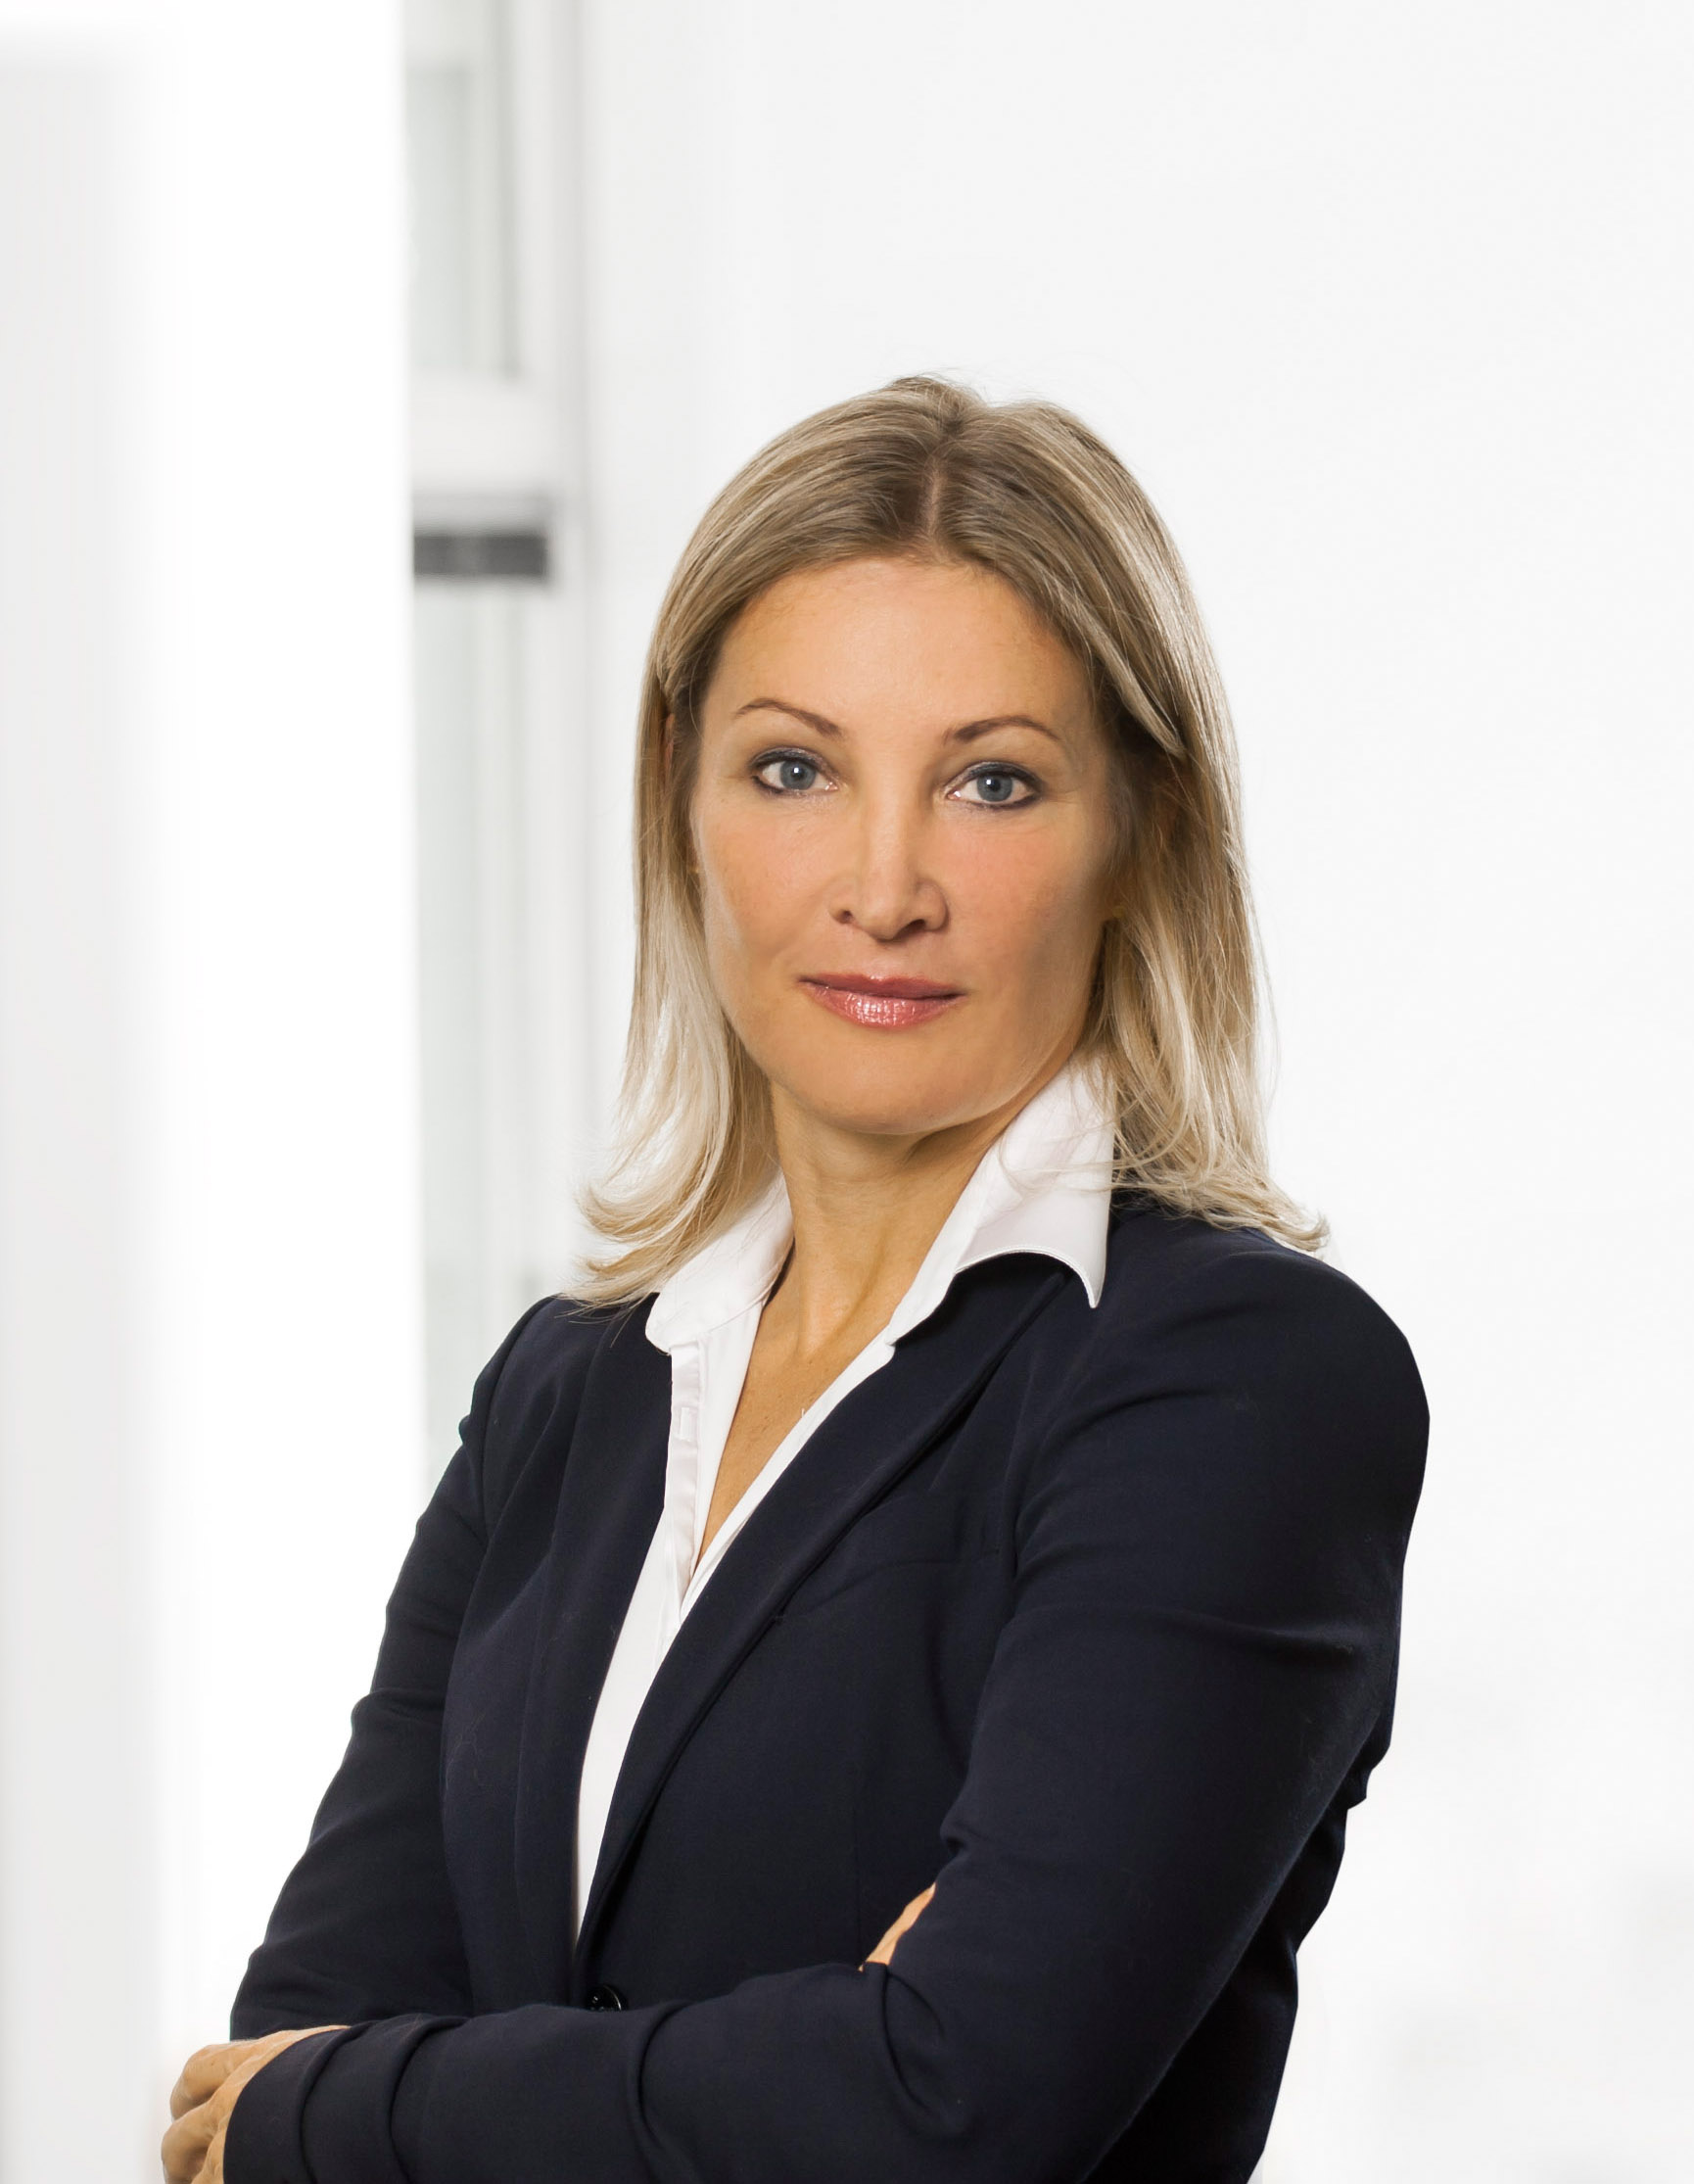 Barbara Nobis